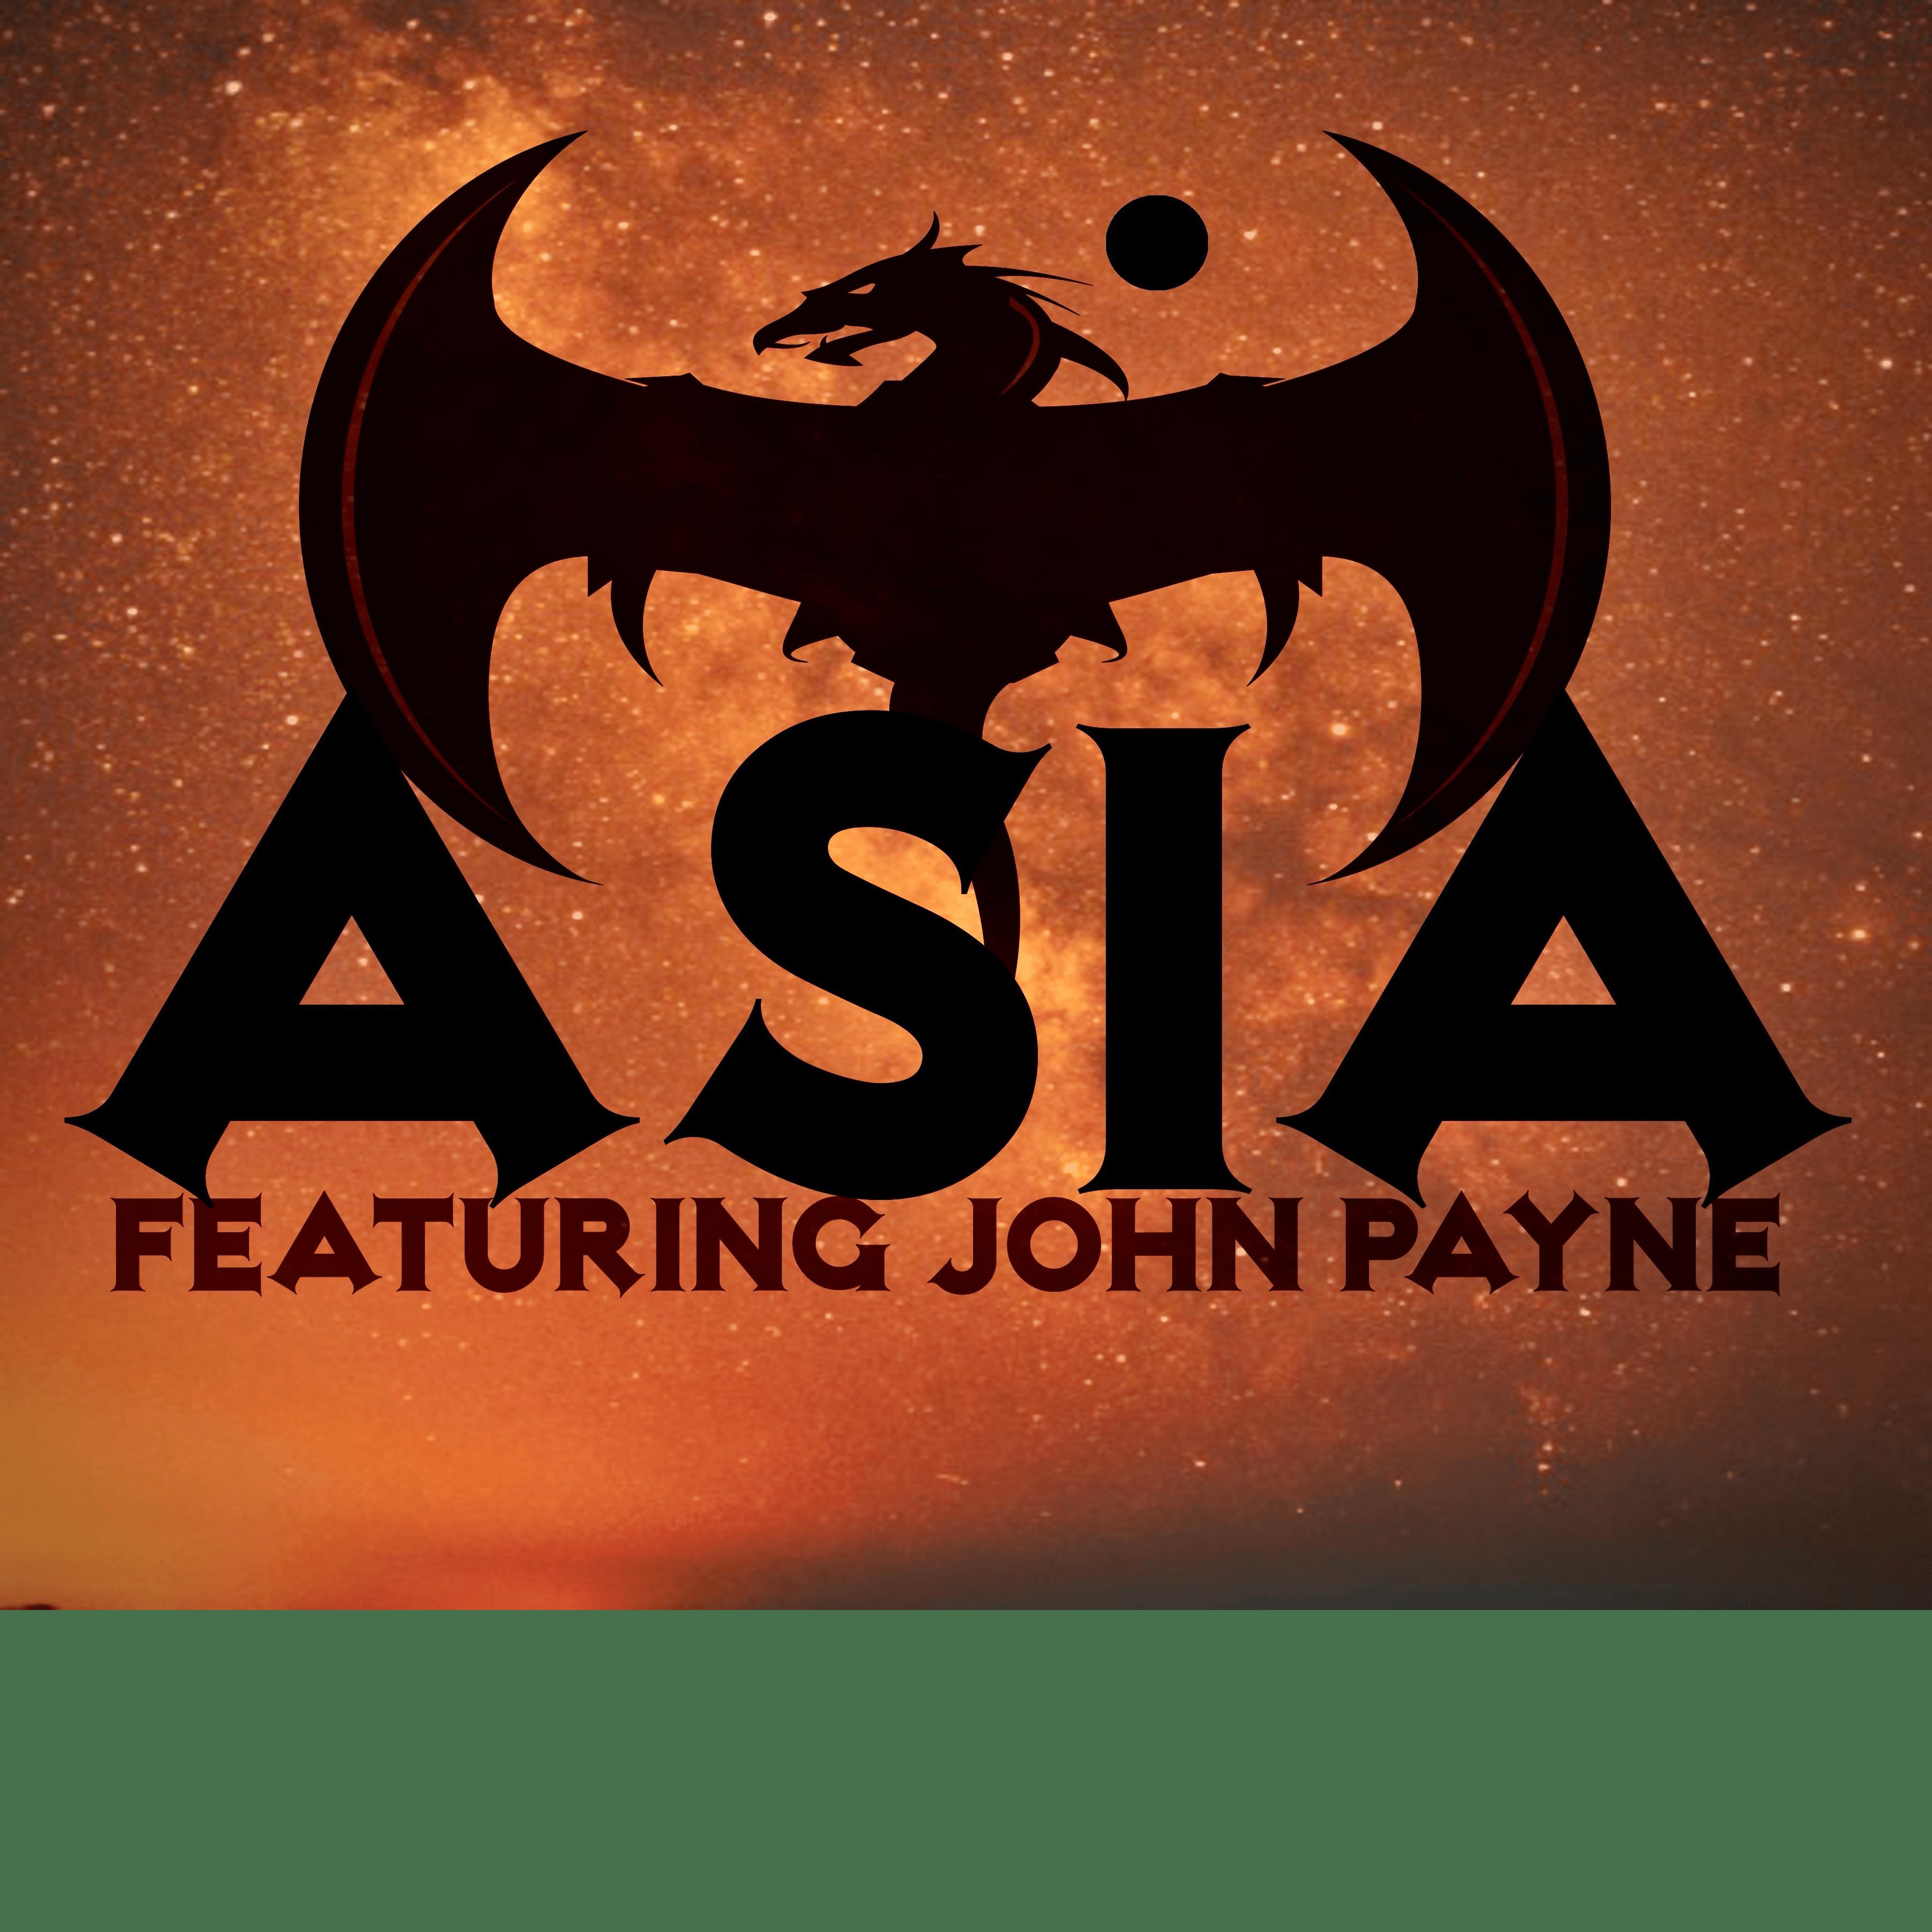 ASIA Featuring John Payne Album